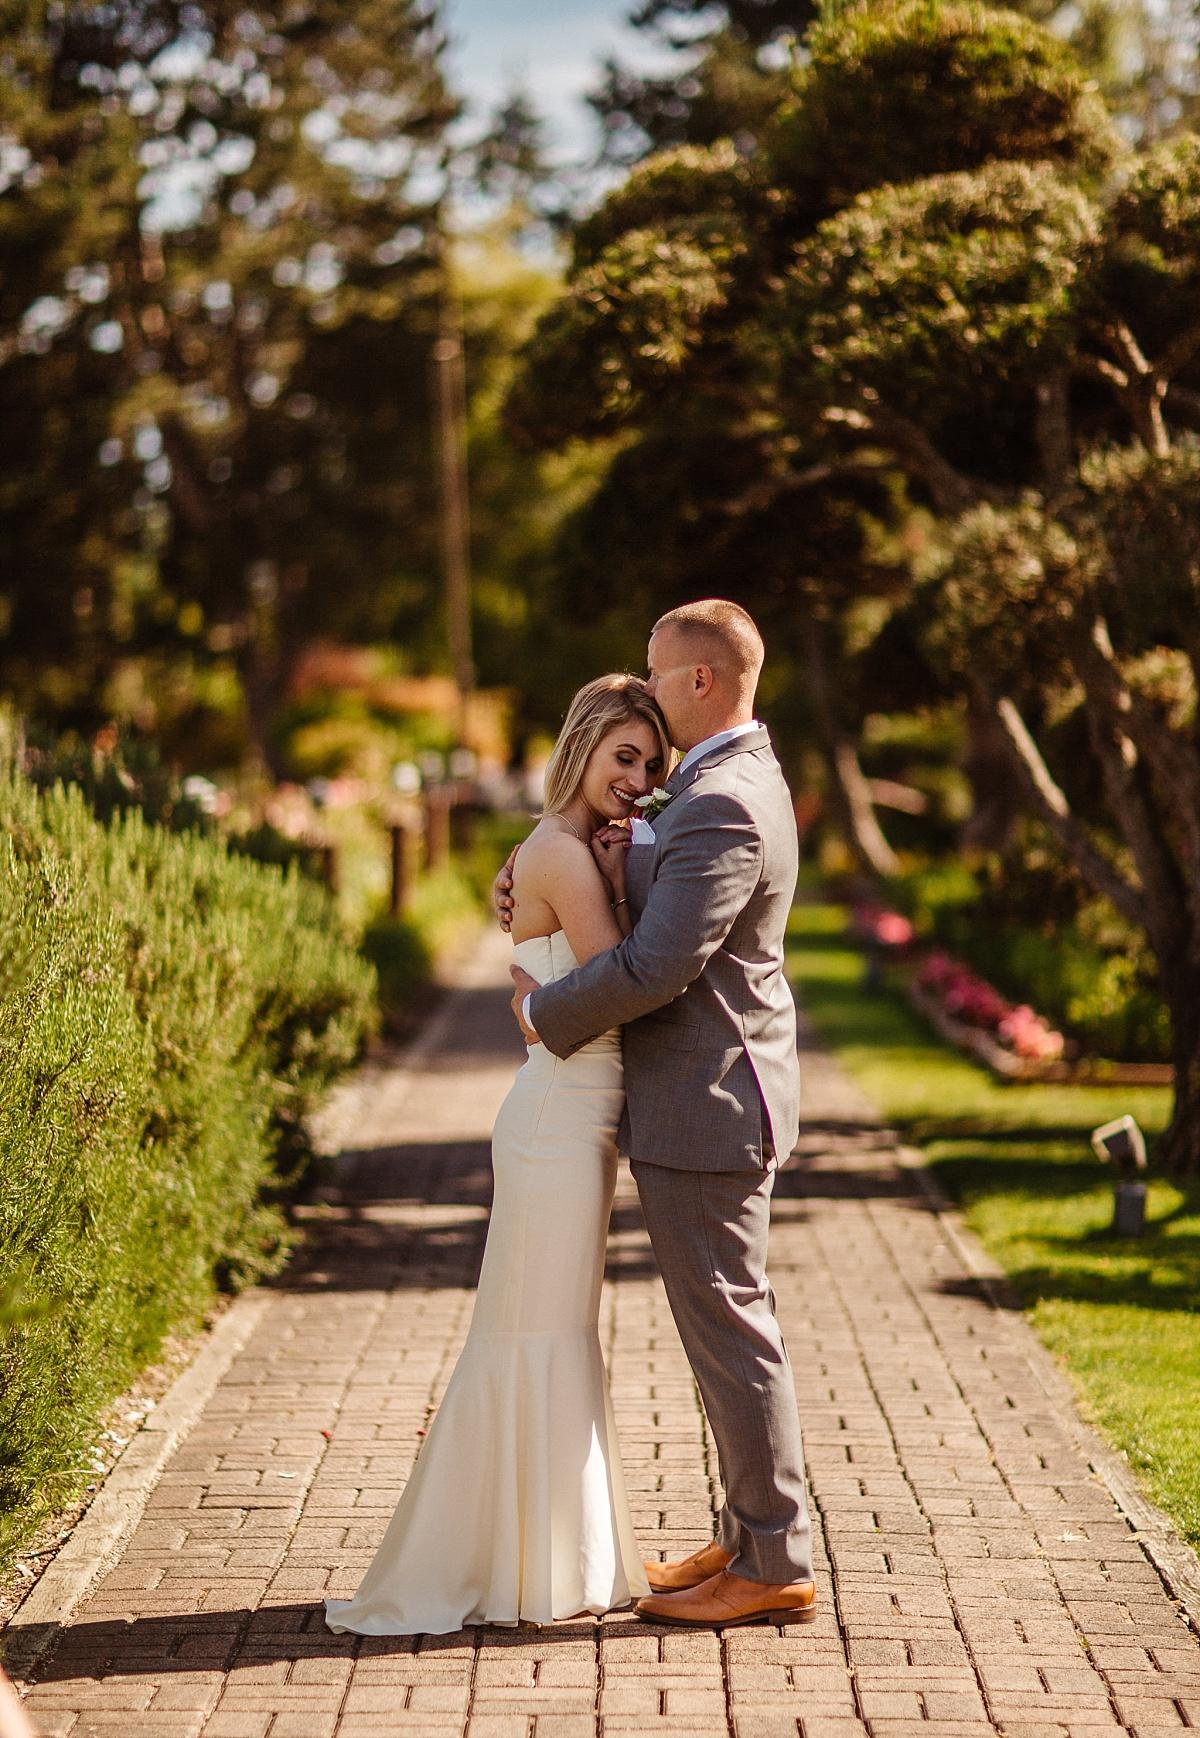 Wiseman-Faces-Photography-Wedding-0029.JPG